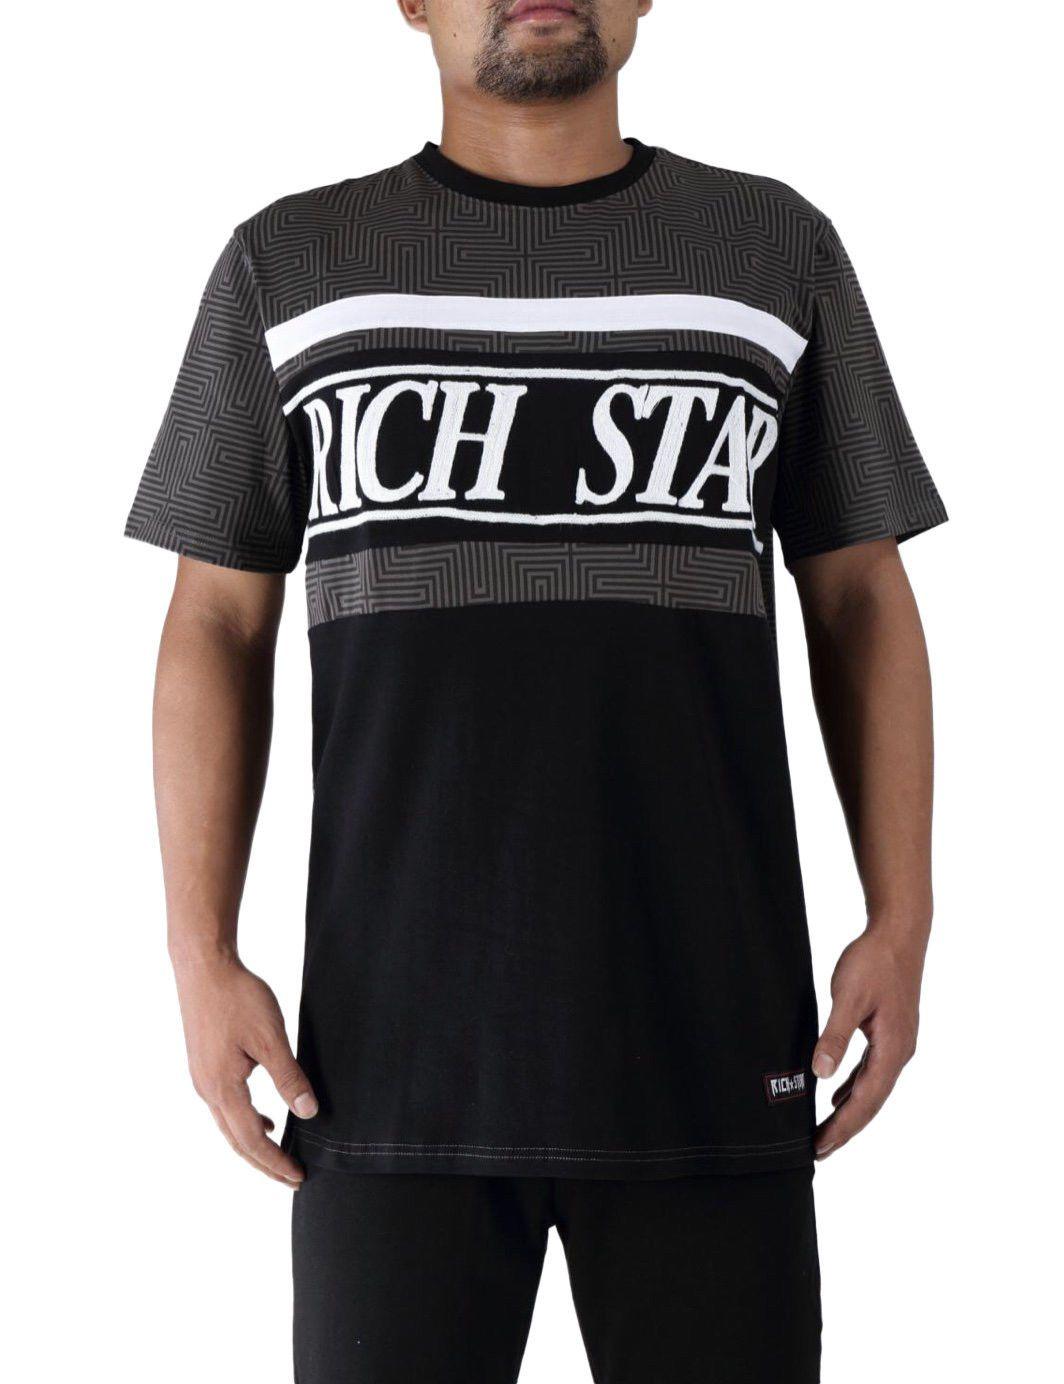 0297b543 High Quality Custom Rich Star Black Big Logo Tape Block T Shirt 100% Cotton  Casual Printing Short Sleeve Men T Shirt O Neck Casual Shirts T Shirts With  From ...